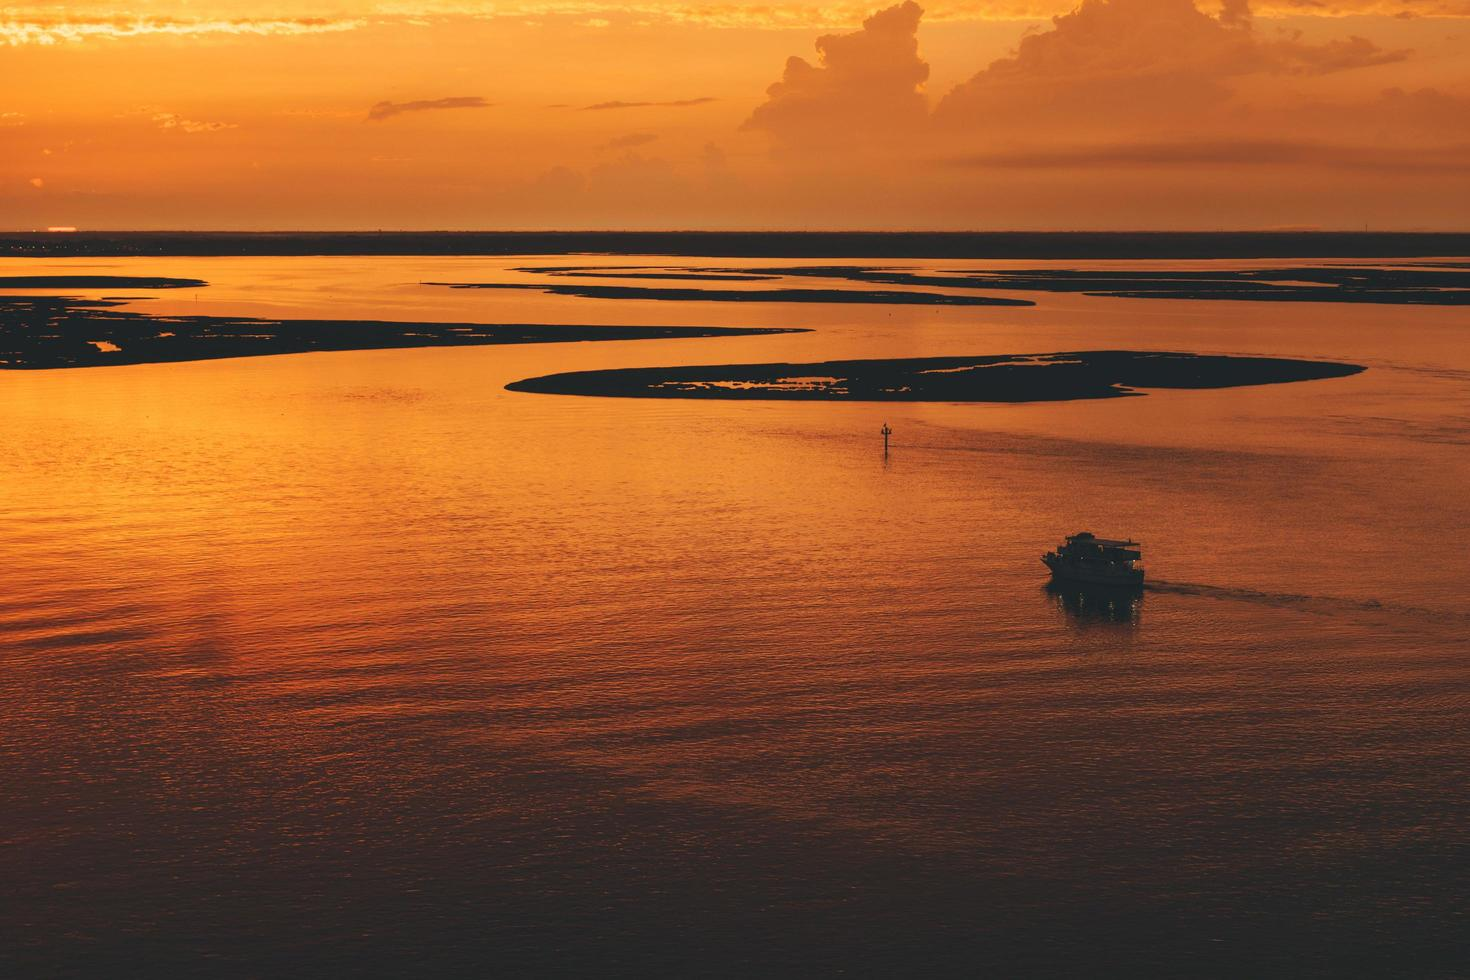 Aerial photo of calm water near islands